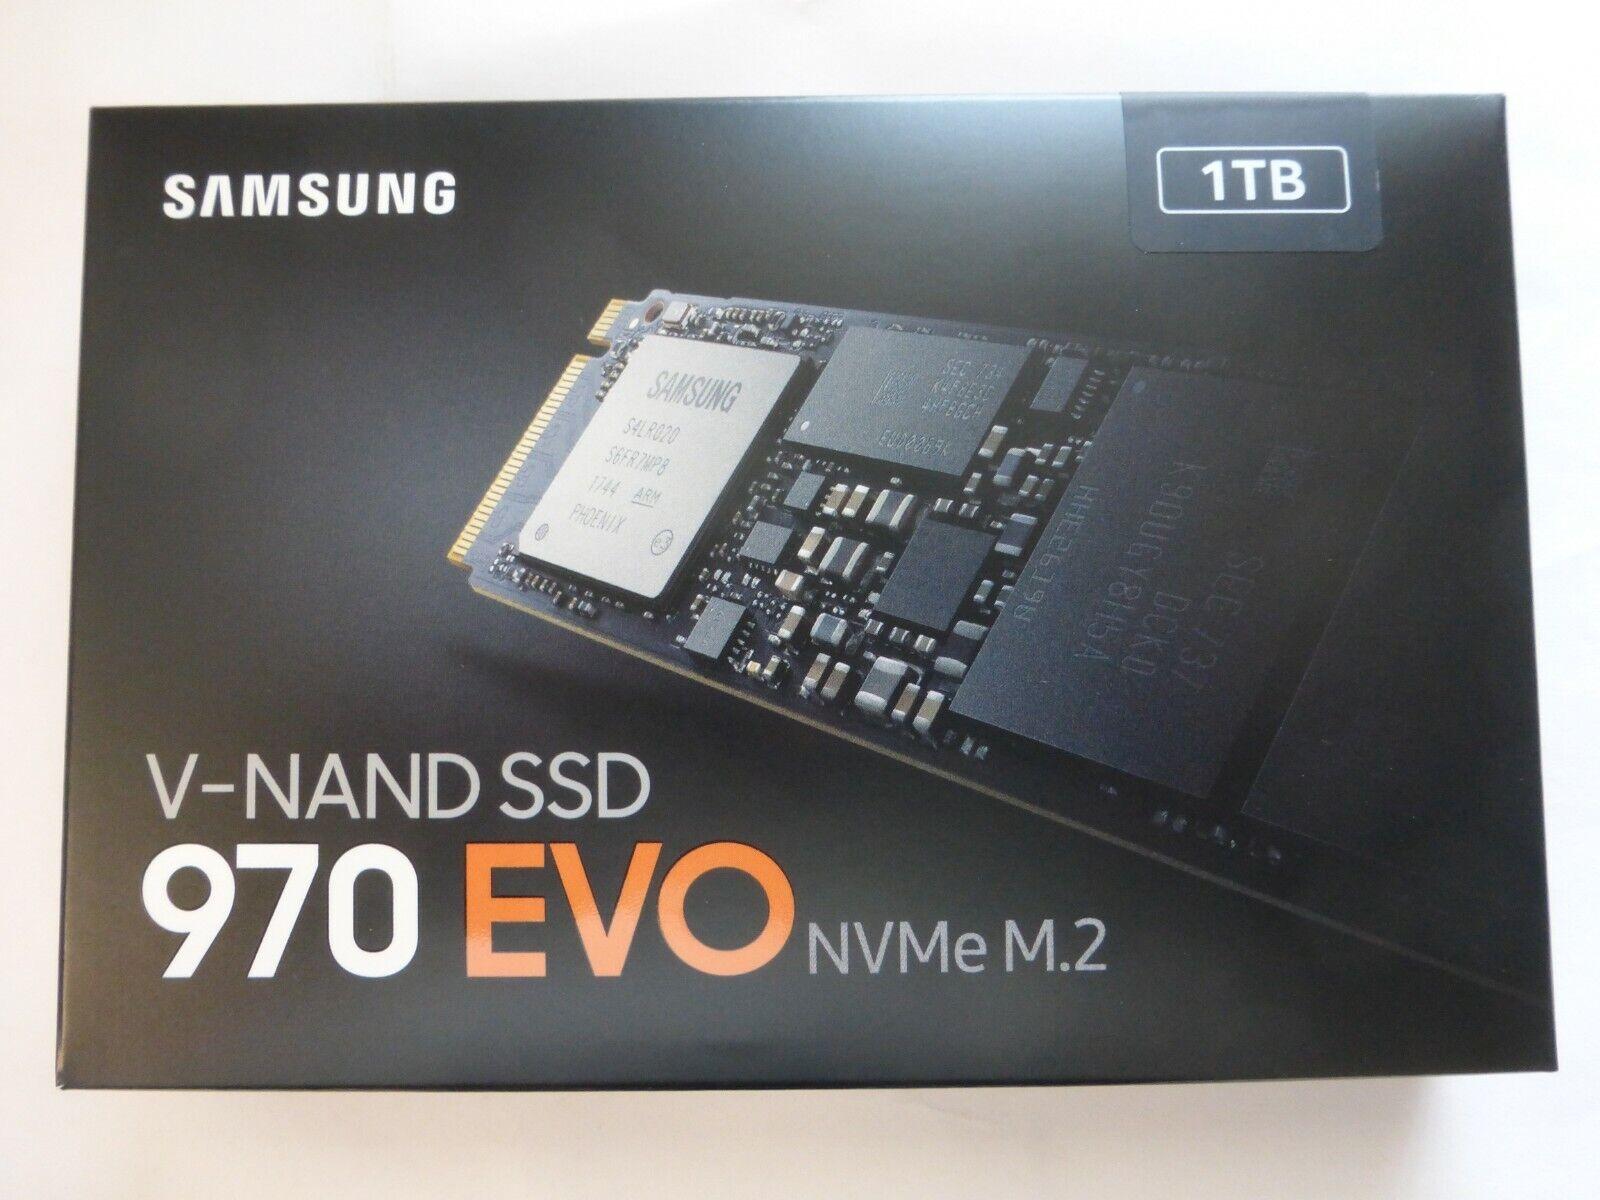 SAMSUNG 970 EVO M.2 1TB PCIe NVMe 3.0 x4 SSD MZ-V7E1T0BW